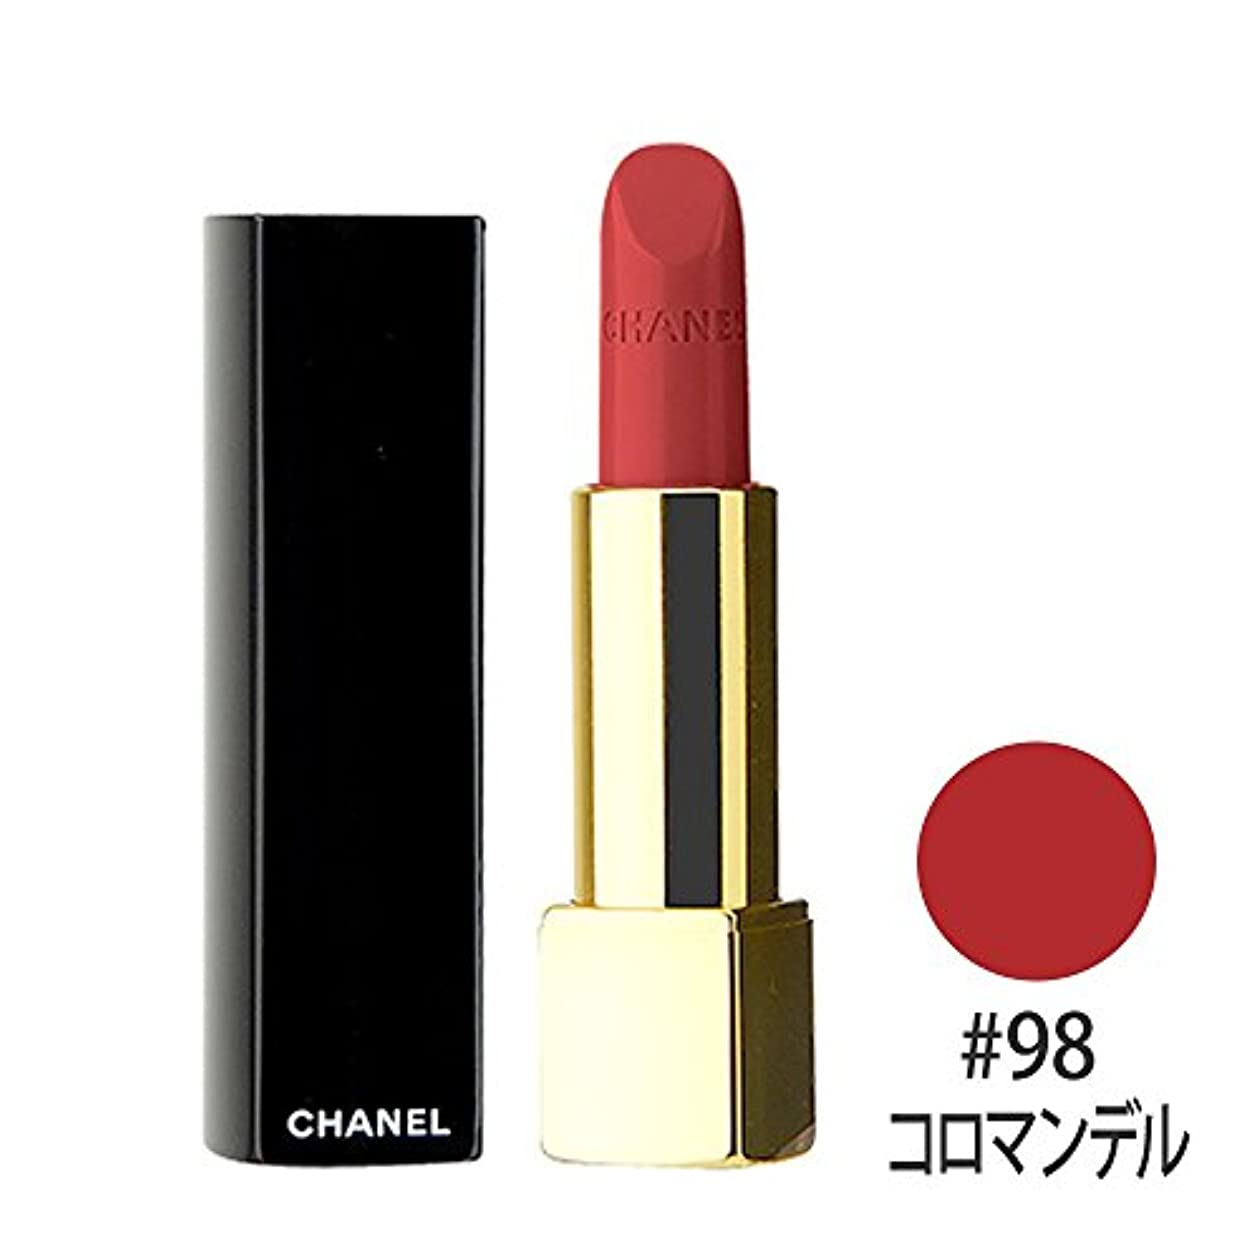 避難襟集計Chanel Rouge Allure Luminous Intense Lip Colour 98 Coromandel [並行輸入品]